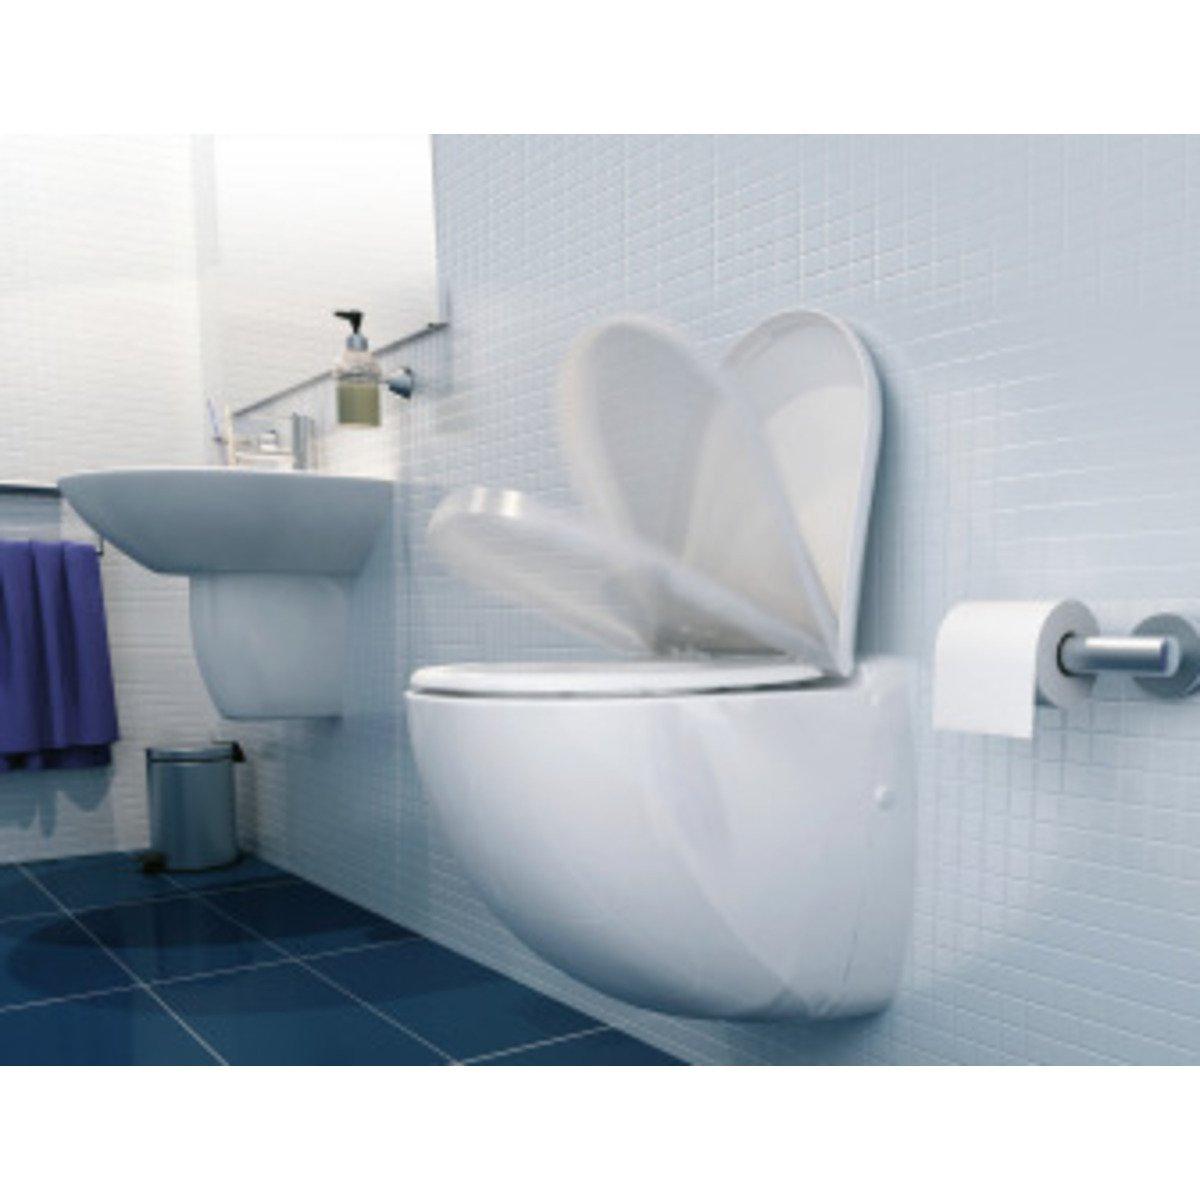 Sanibroyeur Sanicompact Comfort Broyeur Sanitaire Dans tout Toilettes Sanibroyeur